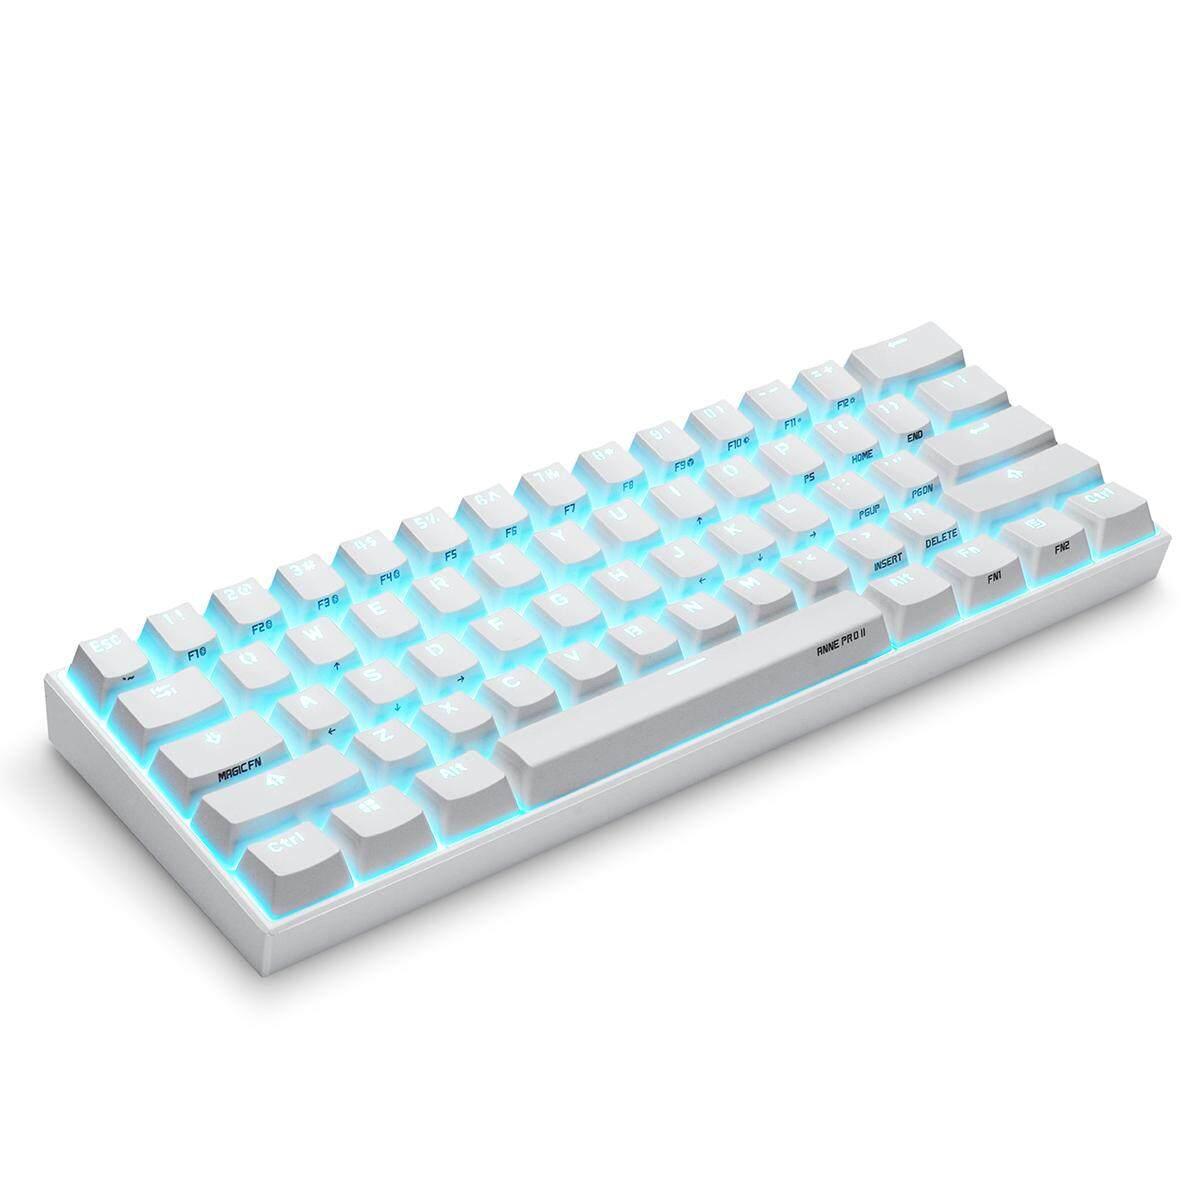 Obins ANNE PRO 2 Gateron Switch USB RGB Mechanical Gaming Keyboard  Bluetooth Backlit 61 Keys (Brown /Red /Blue Switch)